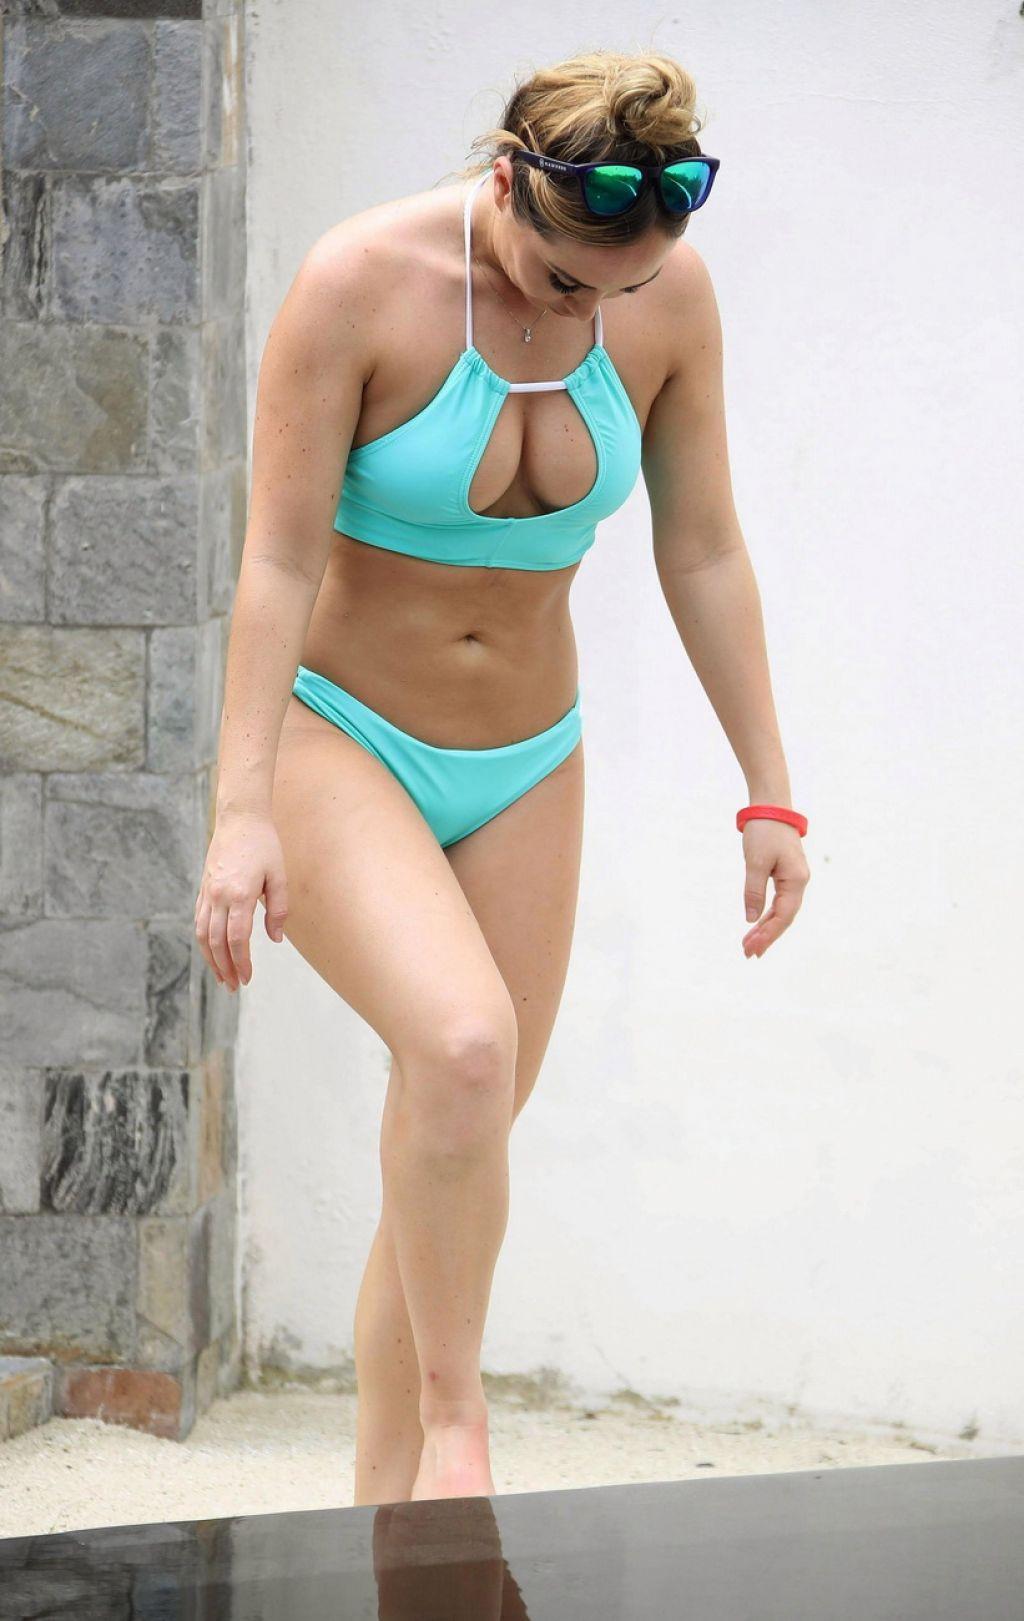 Bikini Lauryn Goodman nude photos 2019